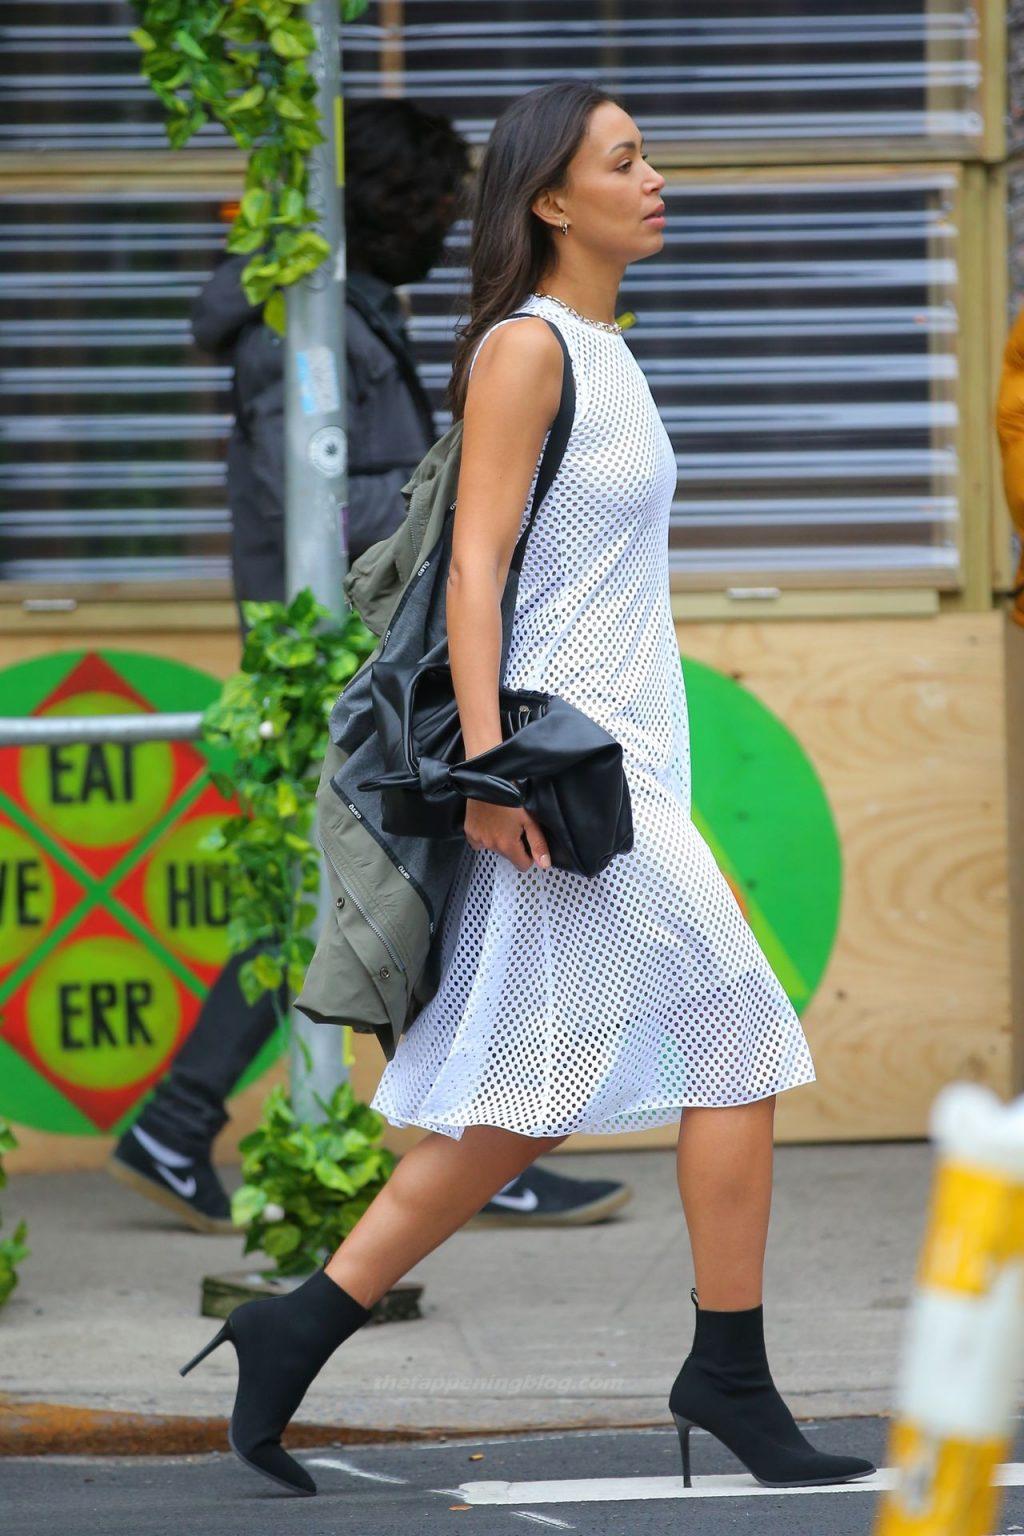 Ilfenesh Hadera Twirls Braless in NYC (35 Photos)